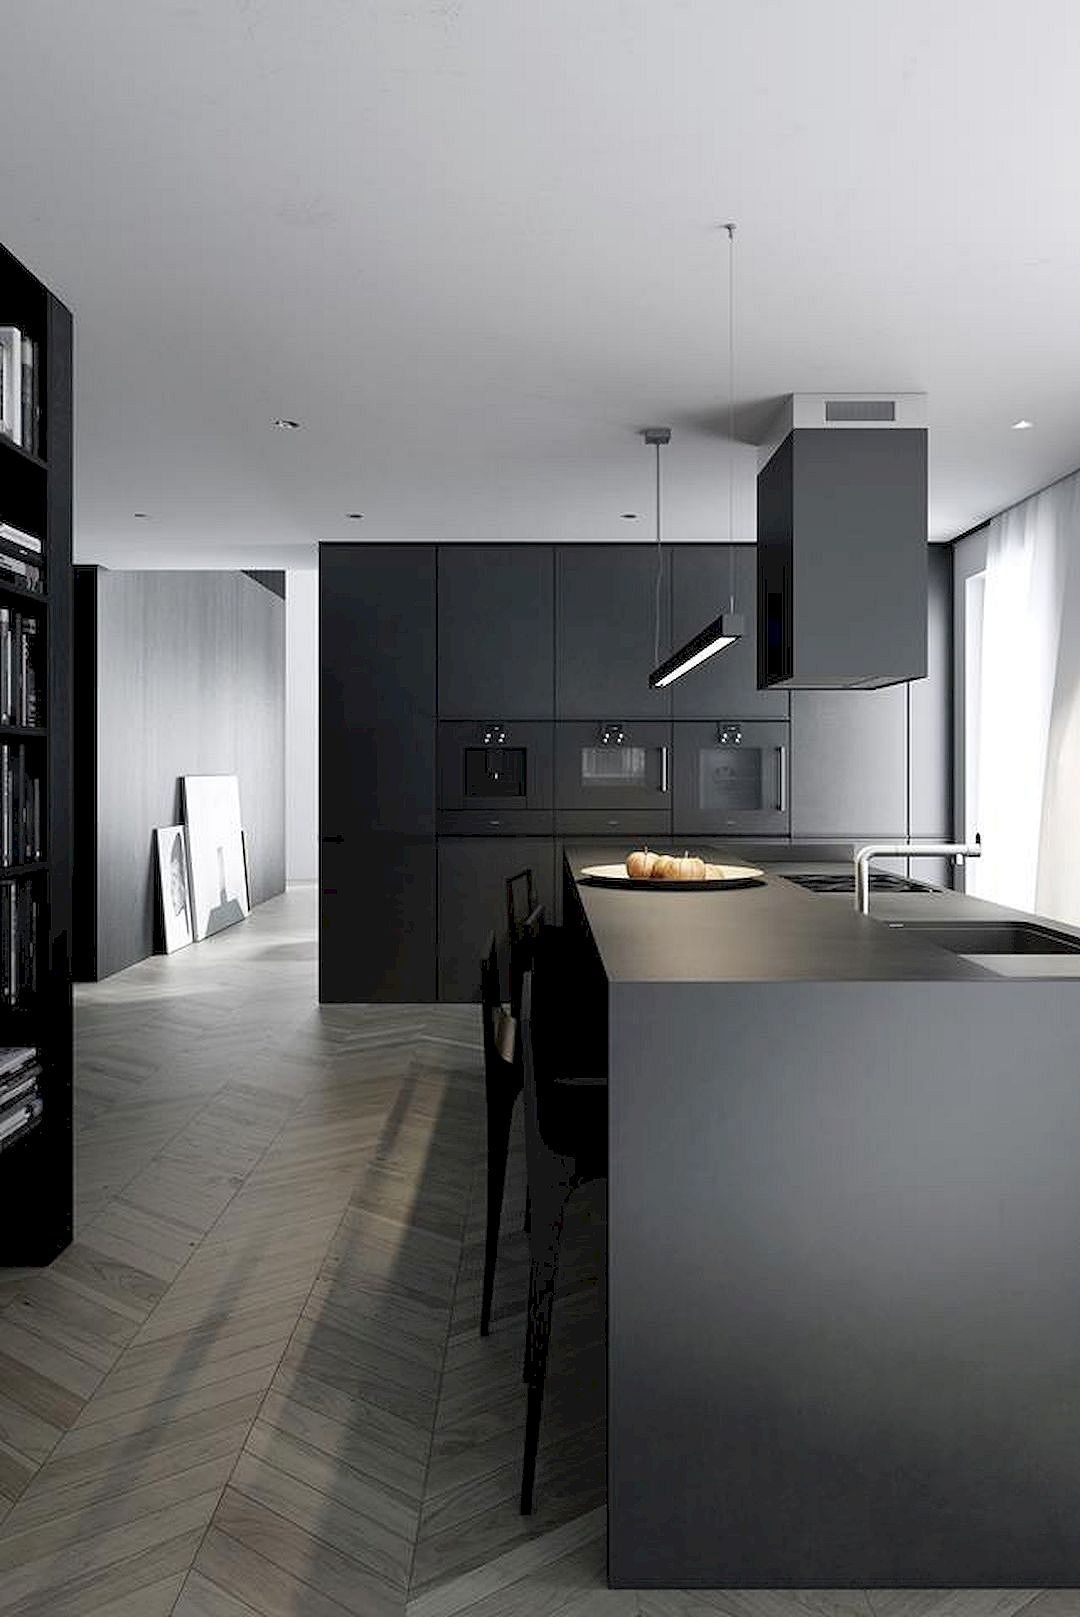 Perfectly Designed Modern Kitchen Inspiration 19 Modern kitchen